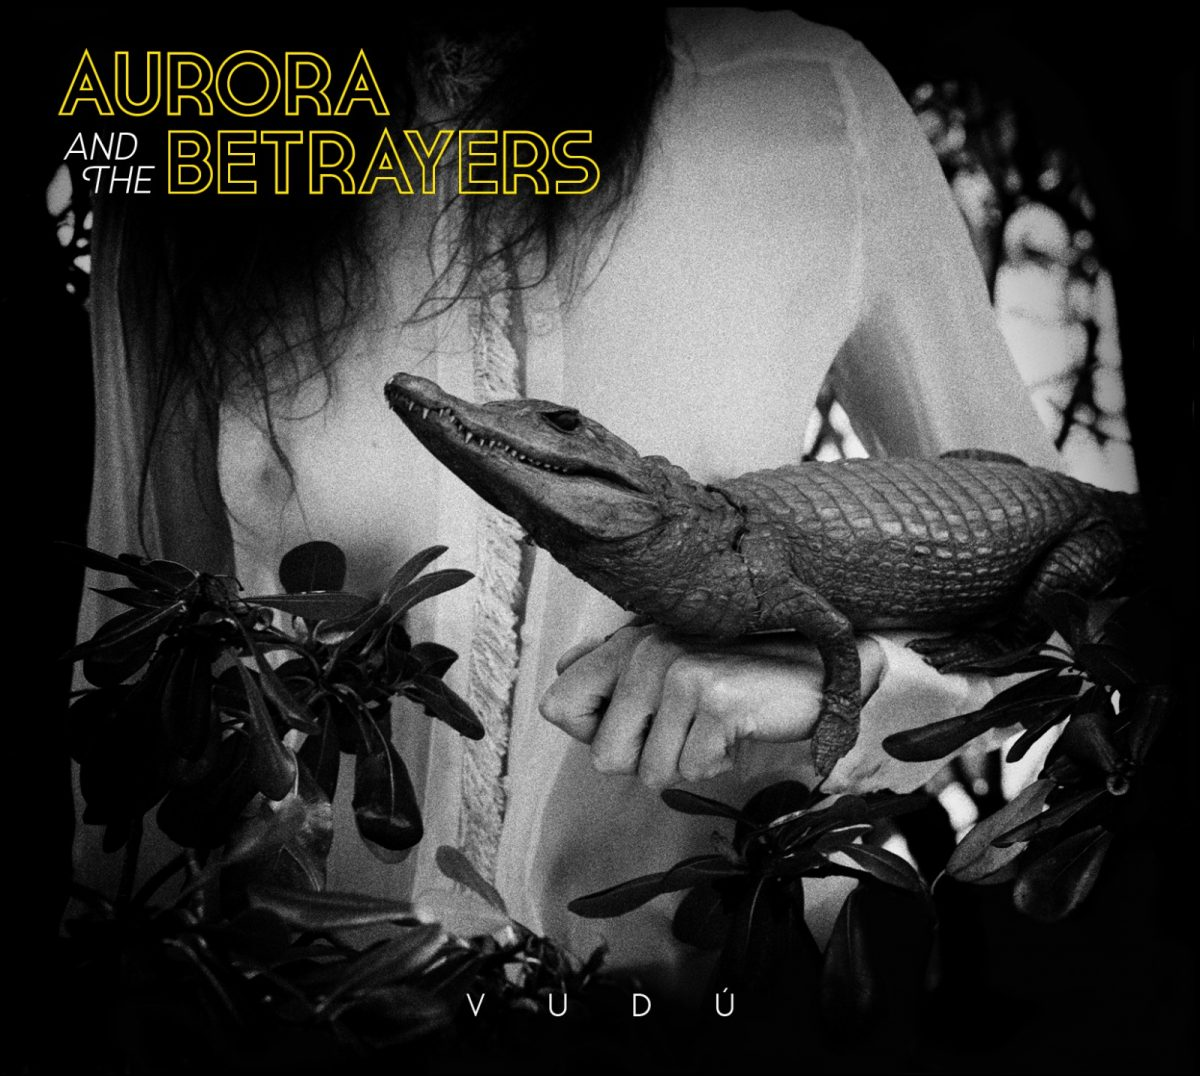 https://www.toledo.es/wp-content/uploads/2017/04/portada-aurora_cover-1200x1076.jpg. AURORA AND THE BETRAYERS